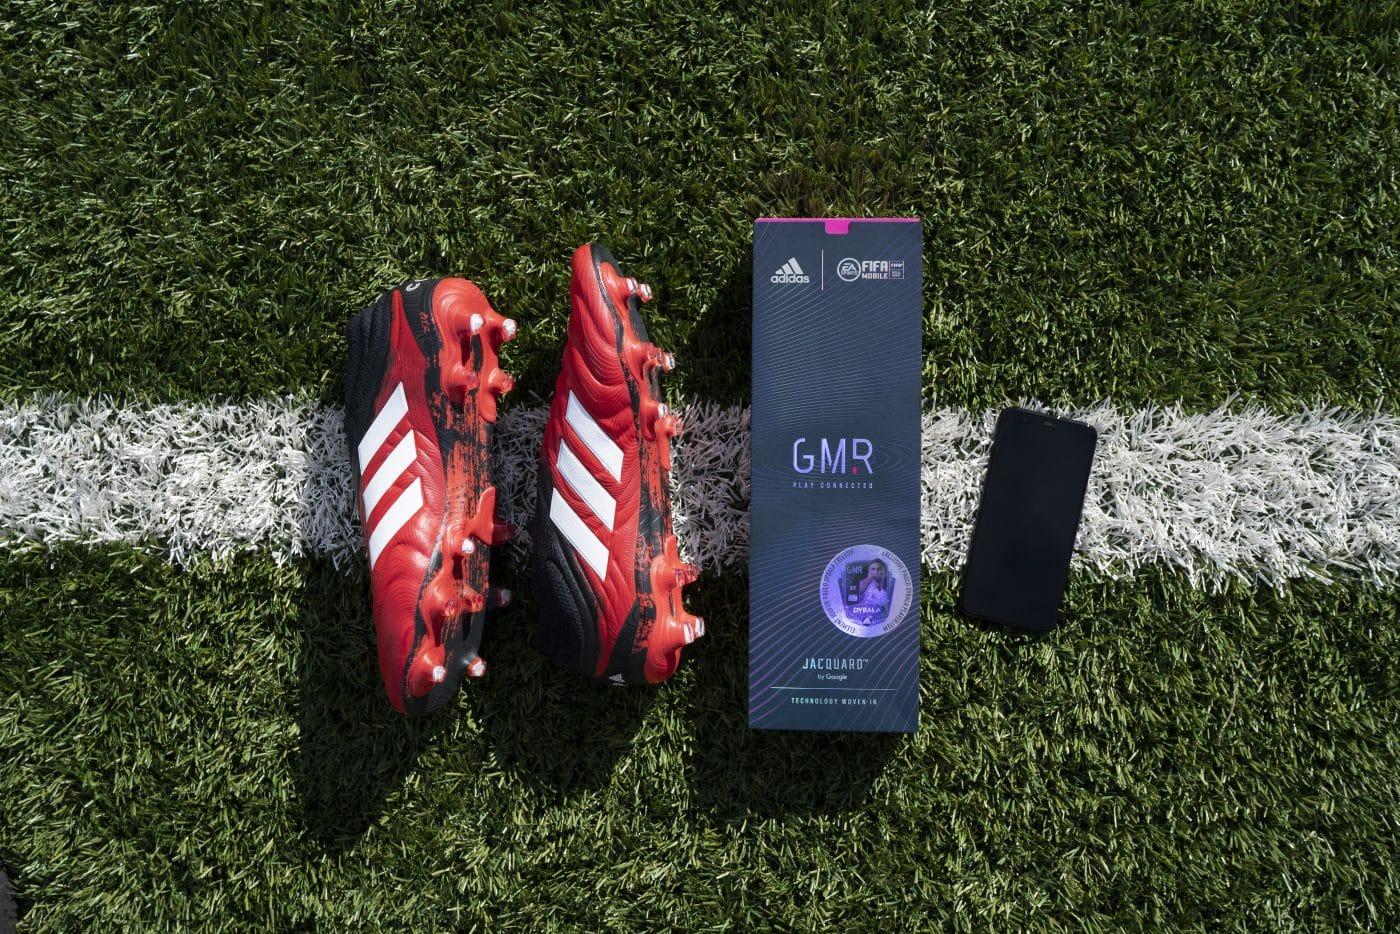 adidas-GMR-semelle-chaussures-de-foot-ea-sports-footpack-6